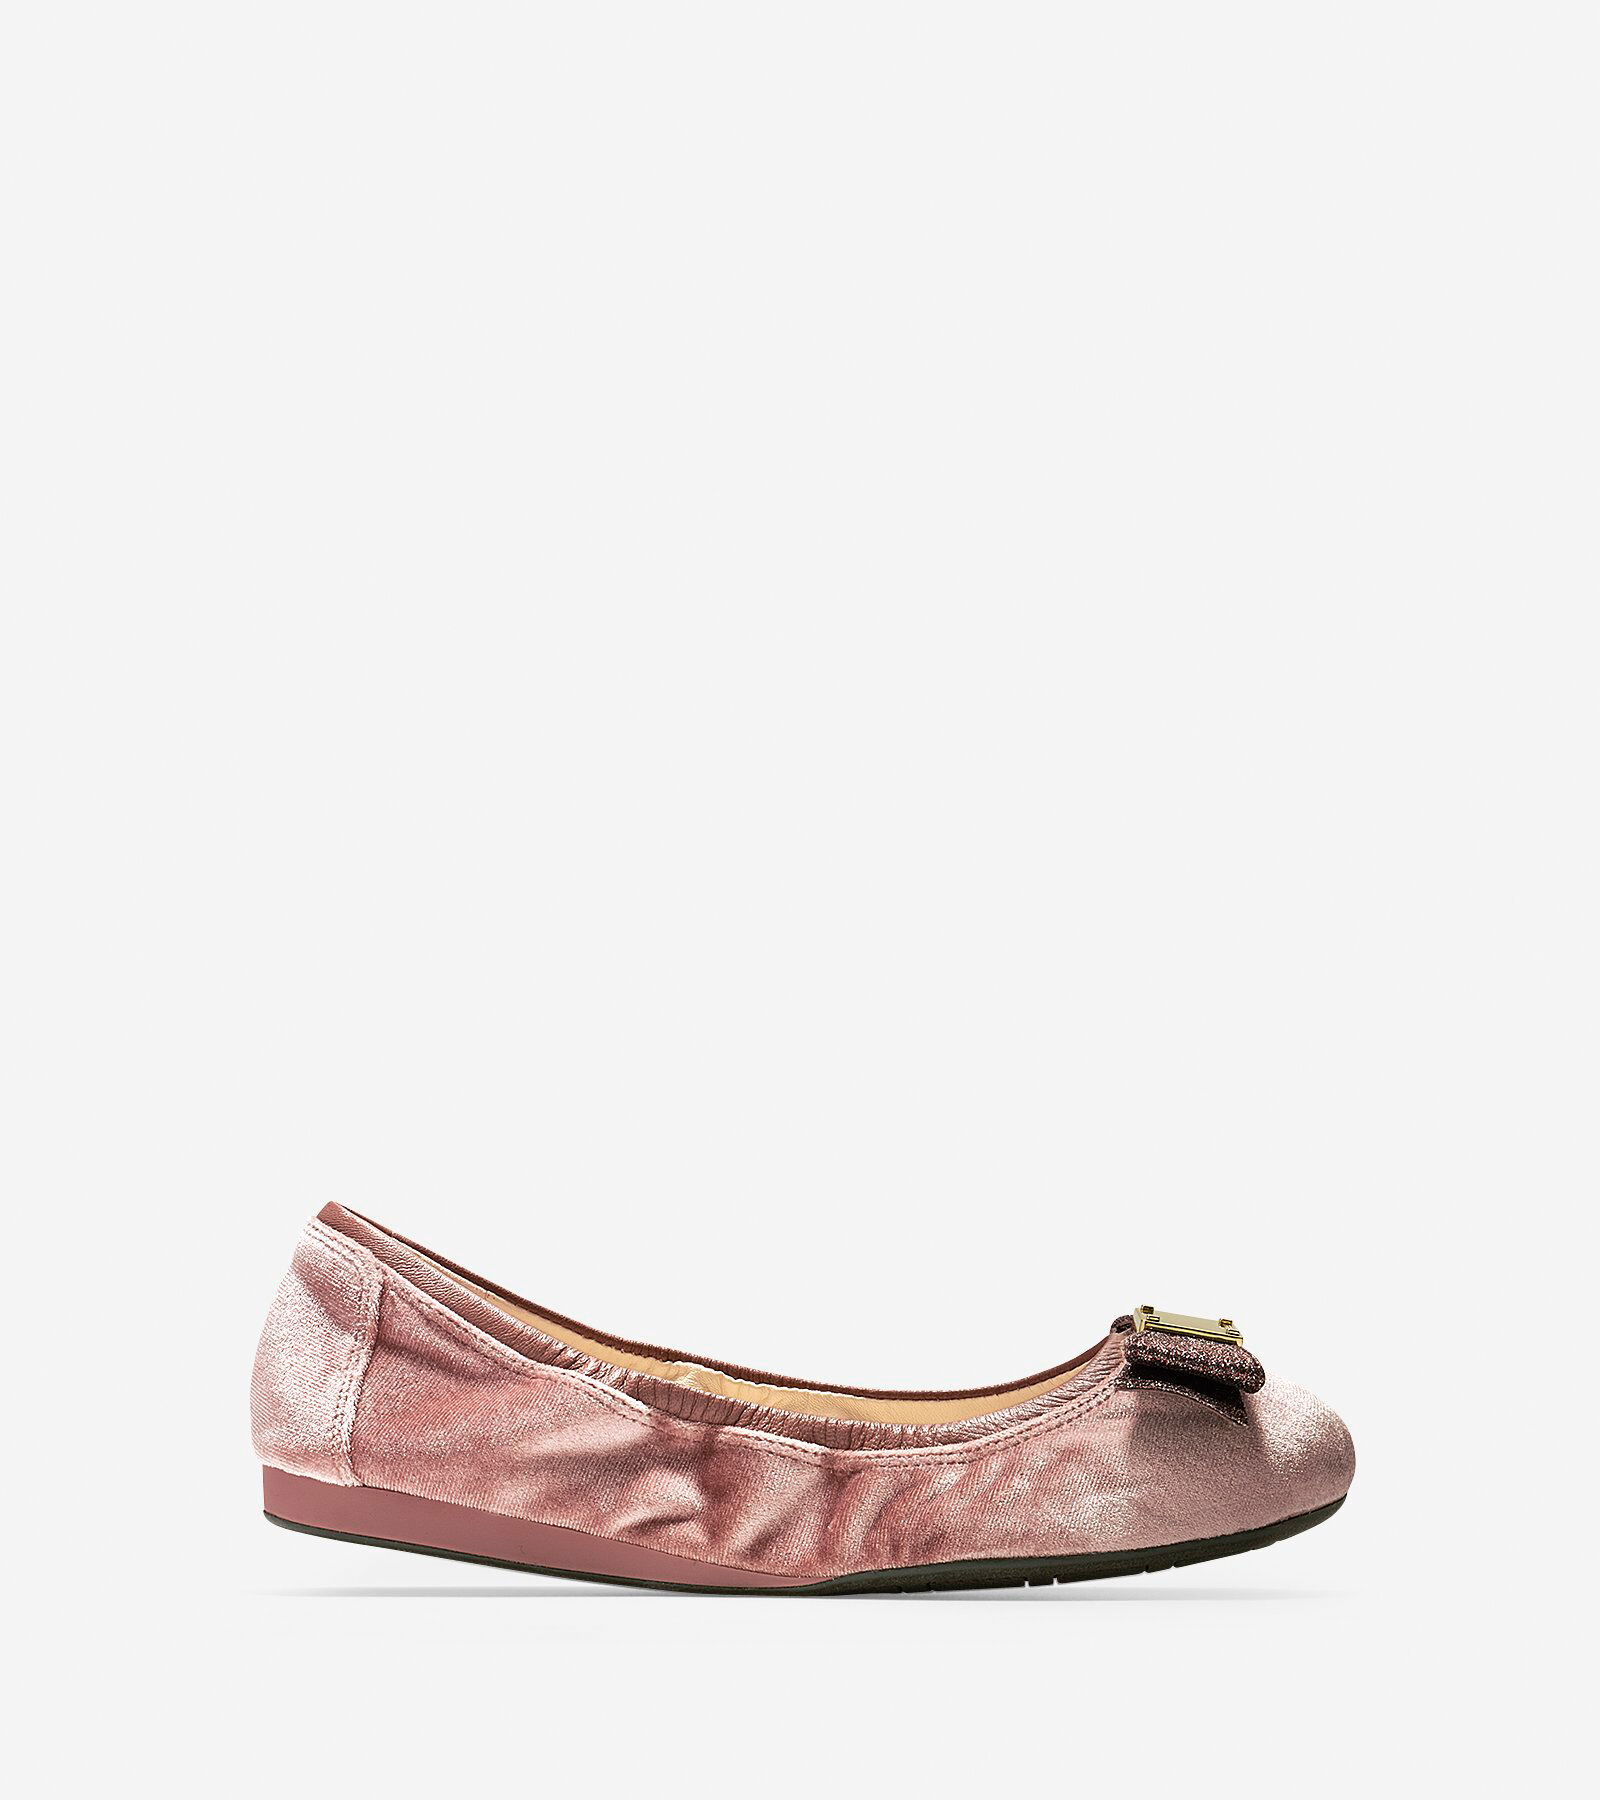 Cole Haan Tali Velvet Ballet Flats zdV1btES